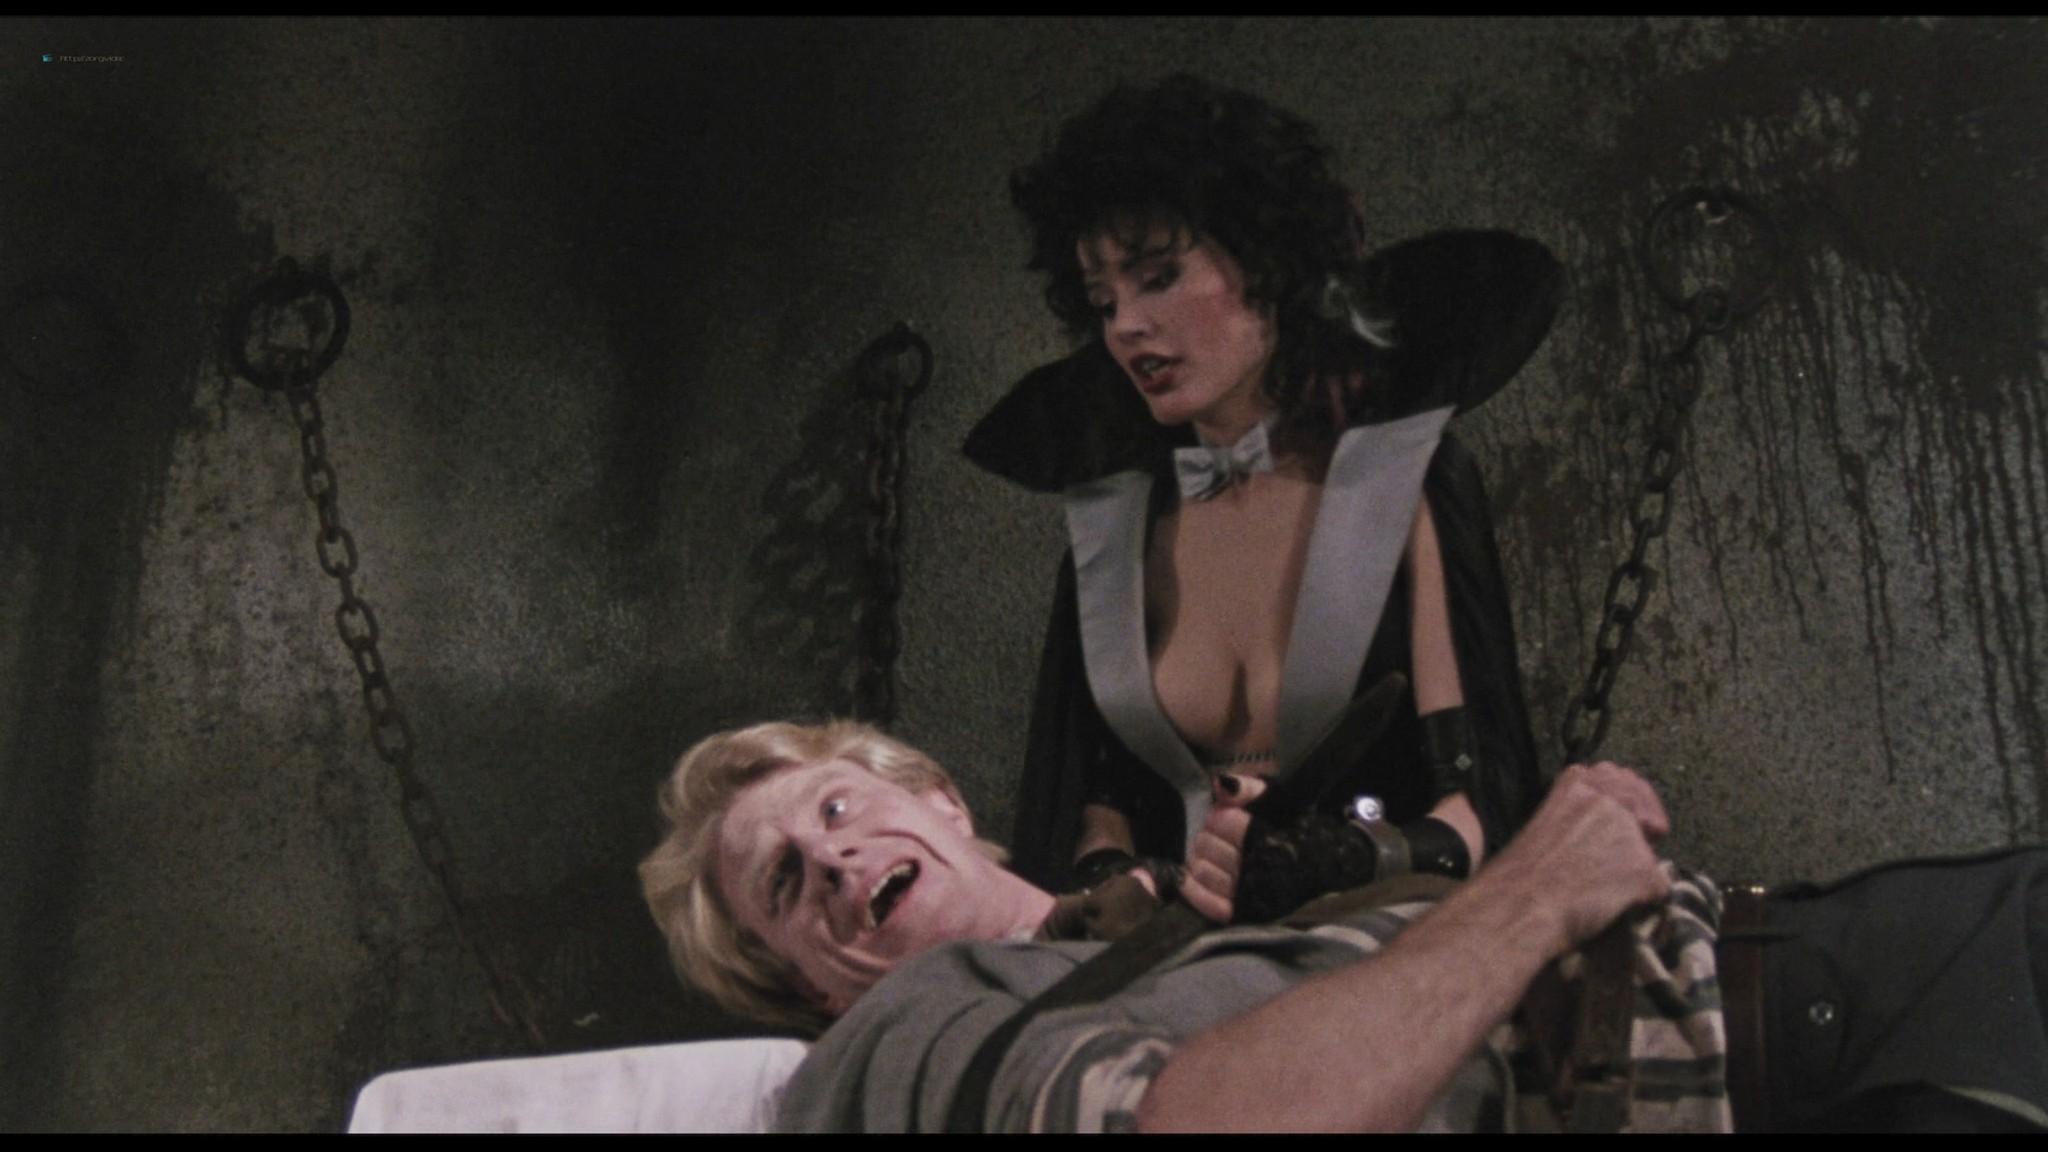 Geena Davis hot and sexy Ksenia Prohaska sexy - Transylvania 6-5000 (1985) HD 1080p BluRay (7)